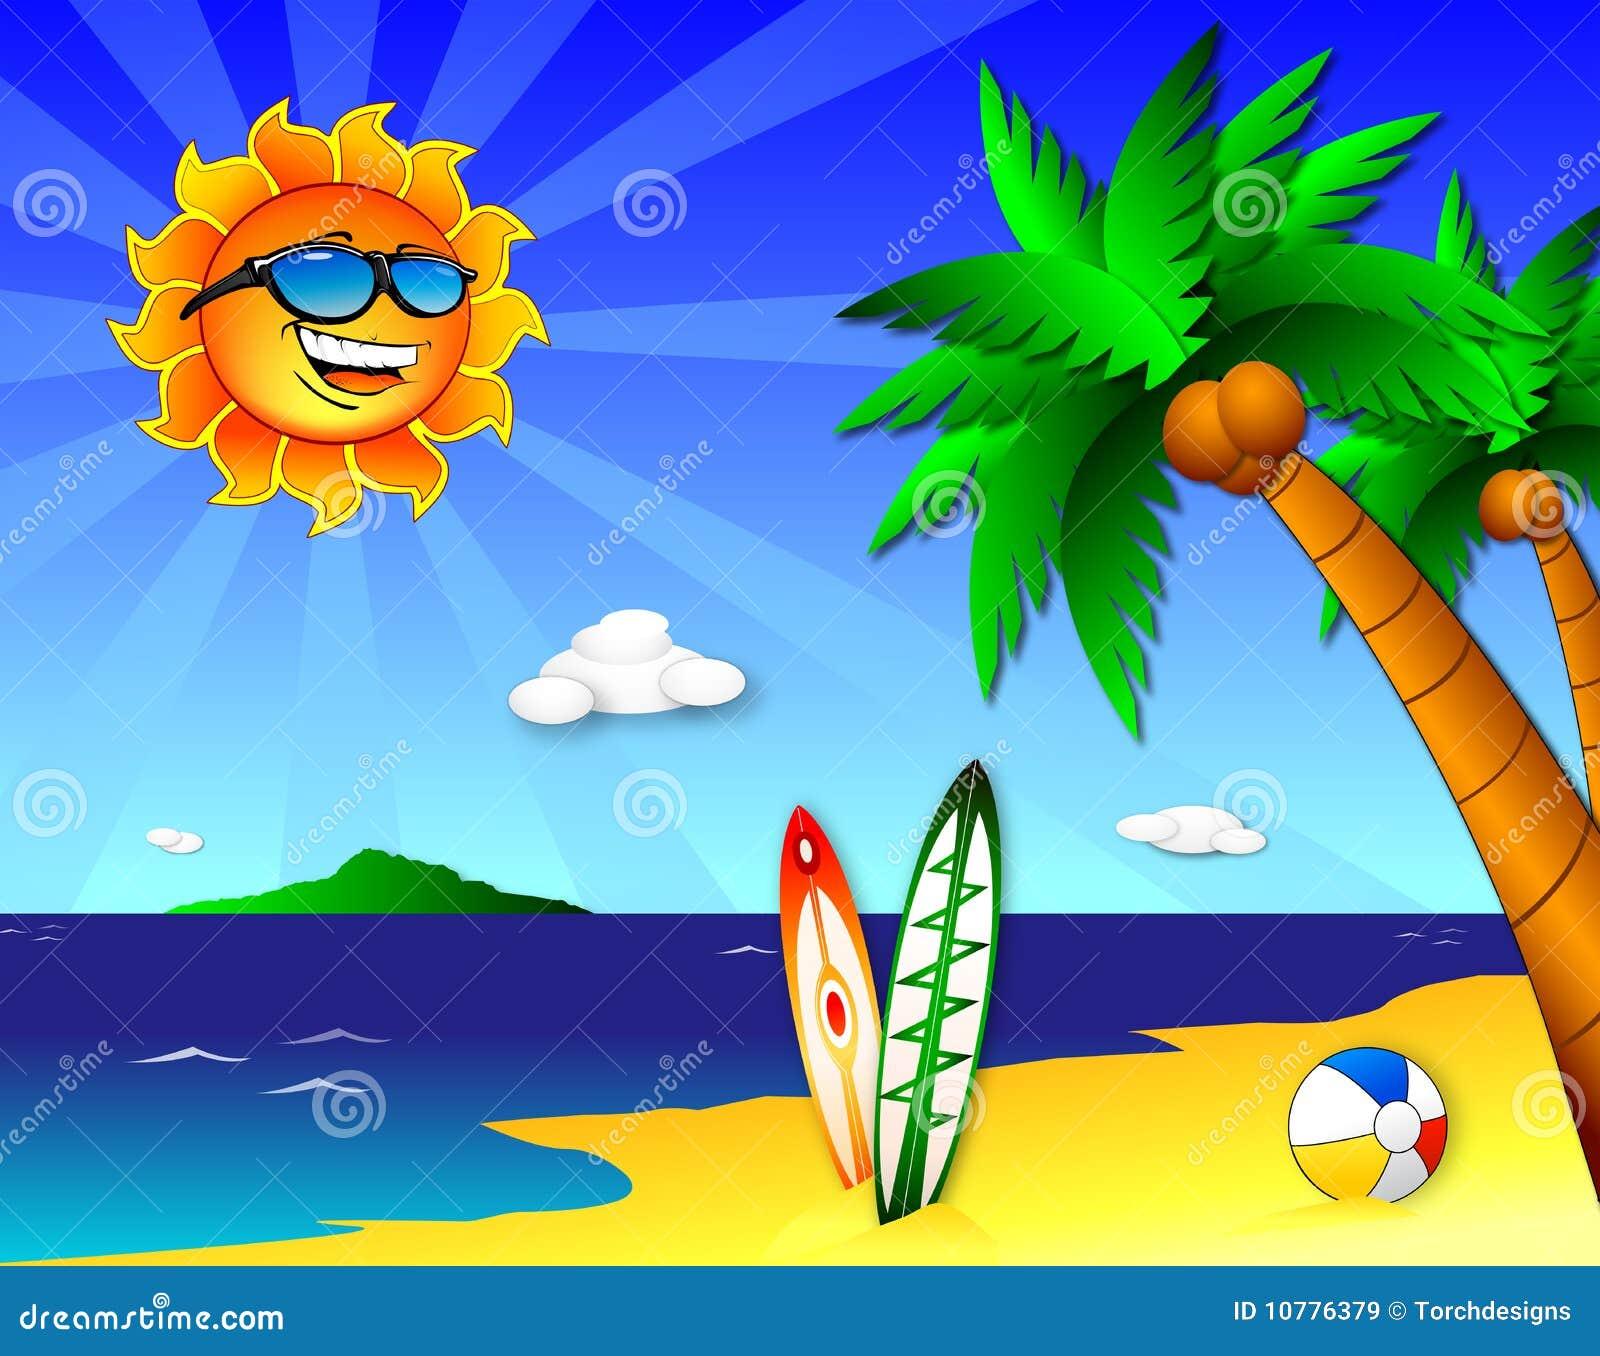 Sun and fun on the Beach